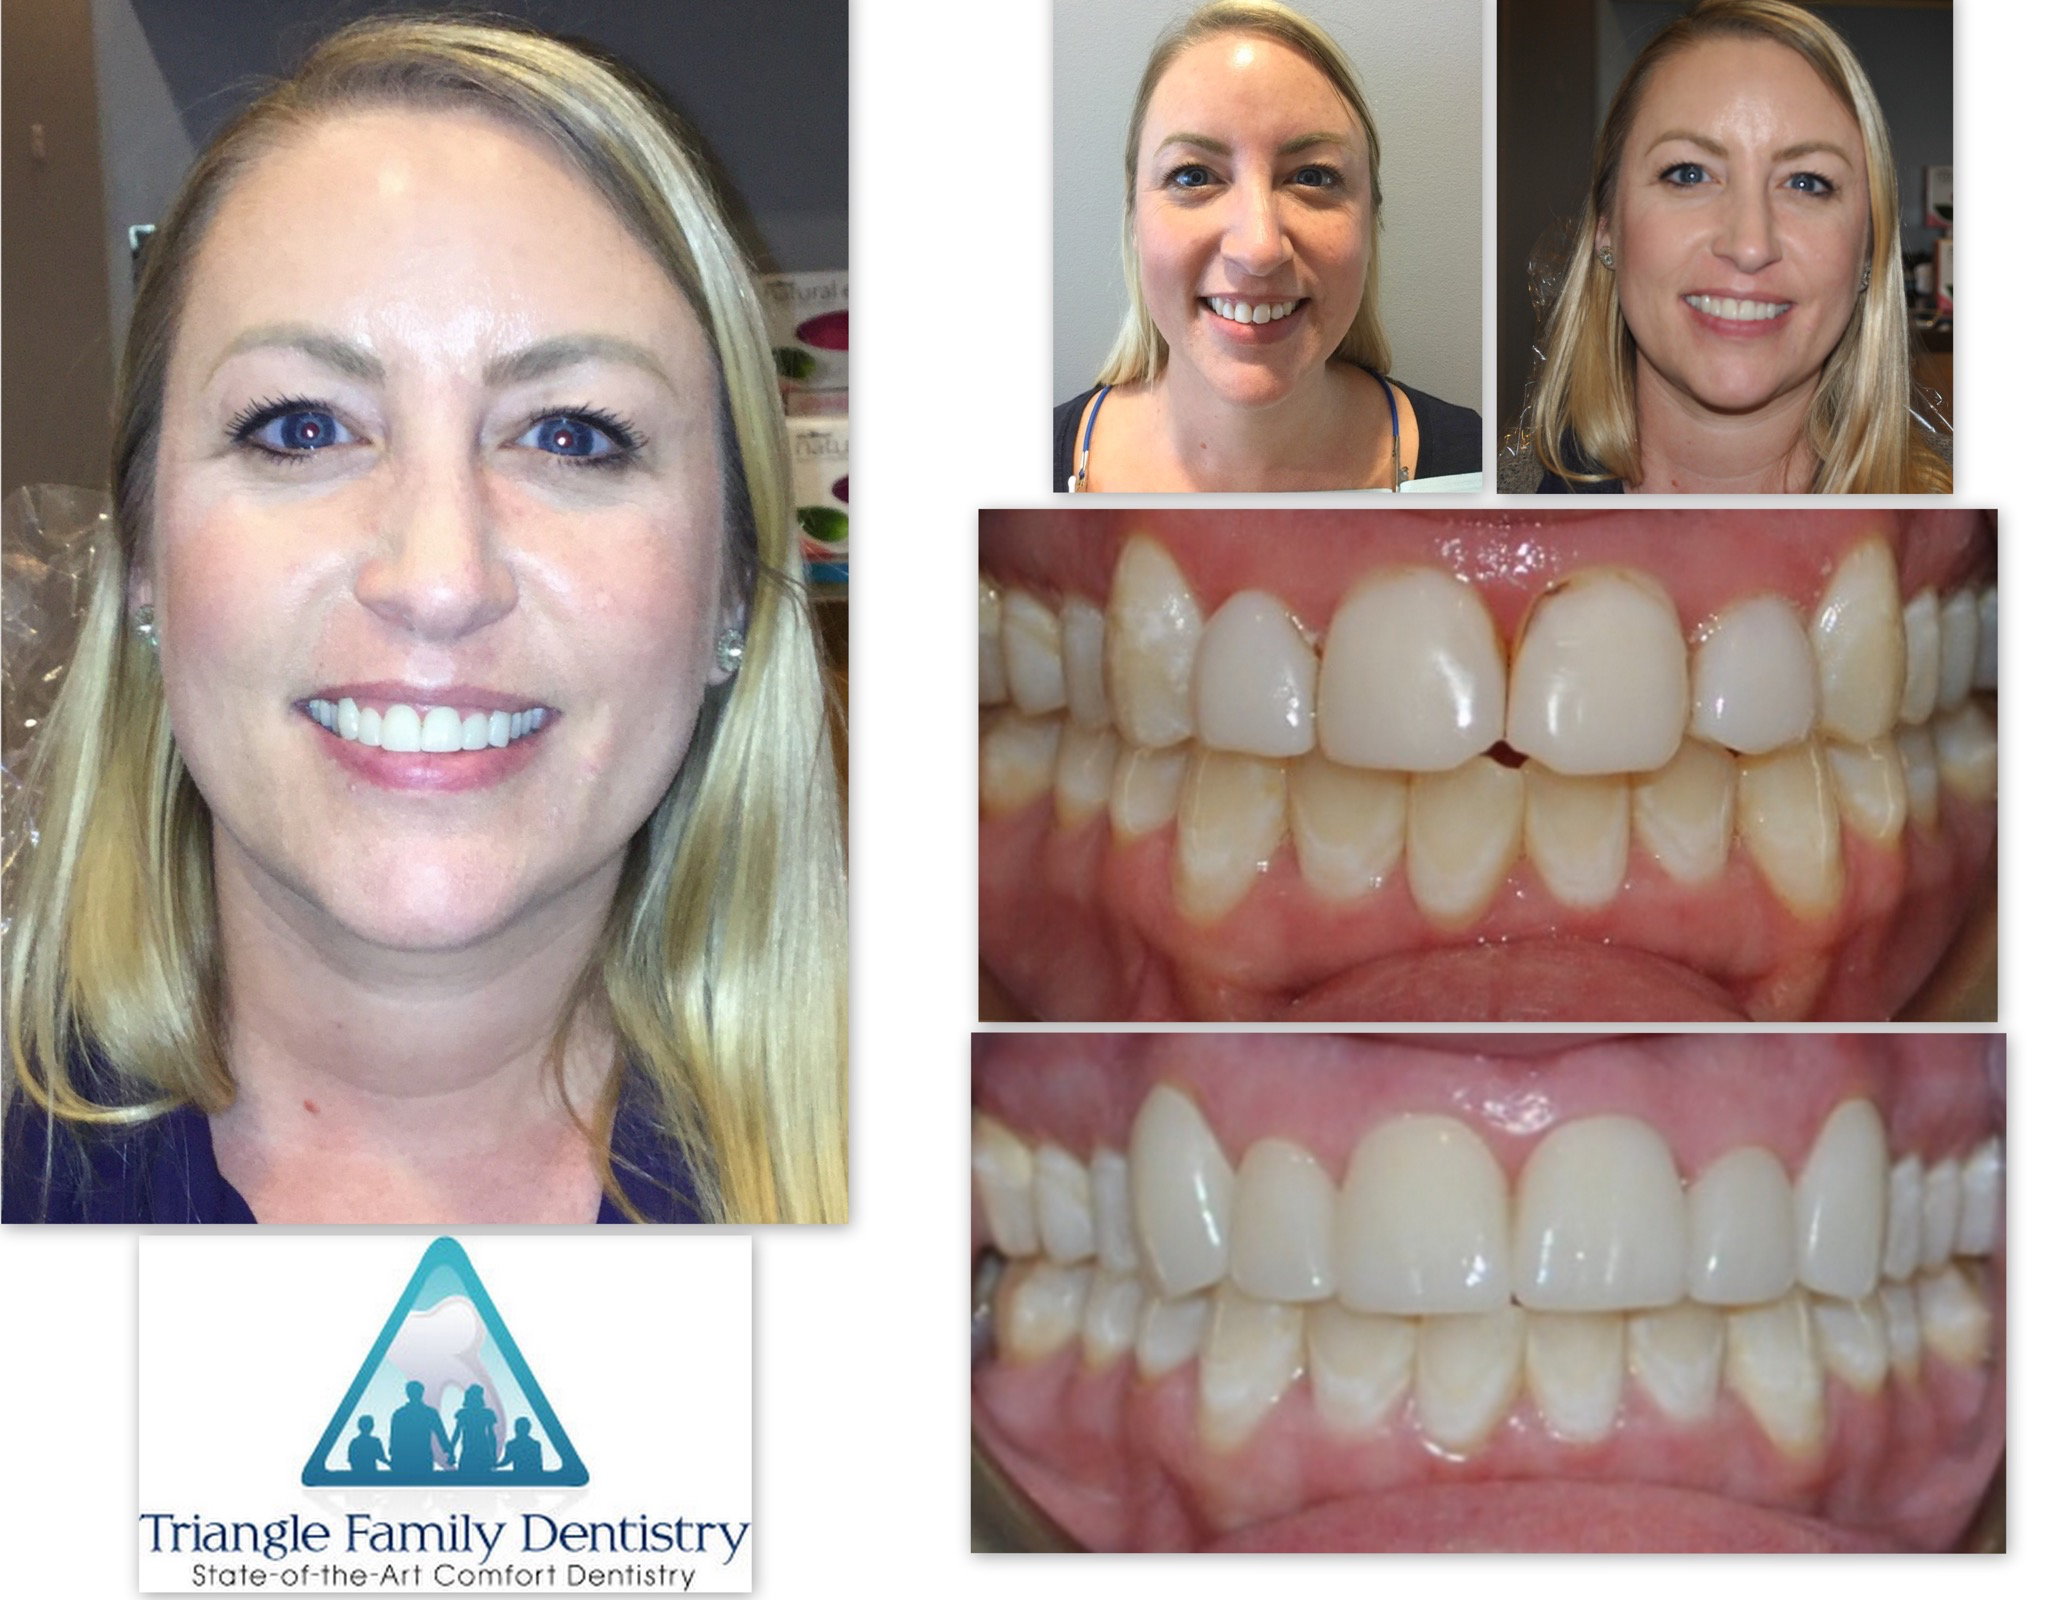 dentist-office-veneers-cosmetic-dentistry-wake-forest-north-carolina